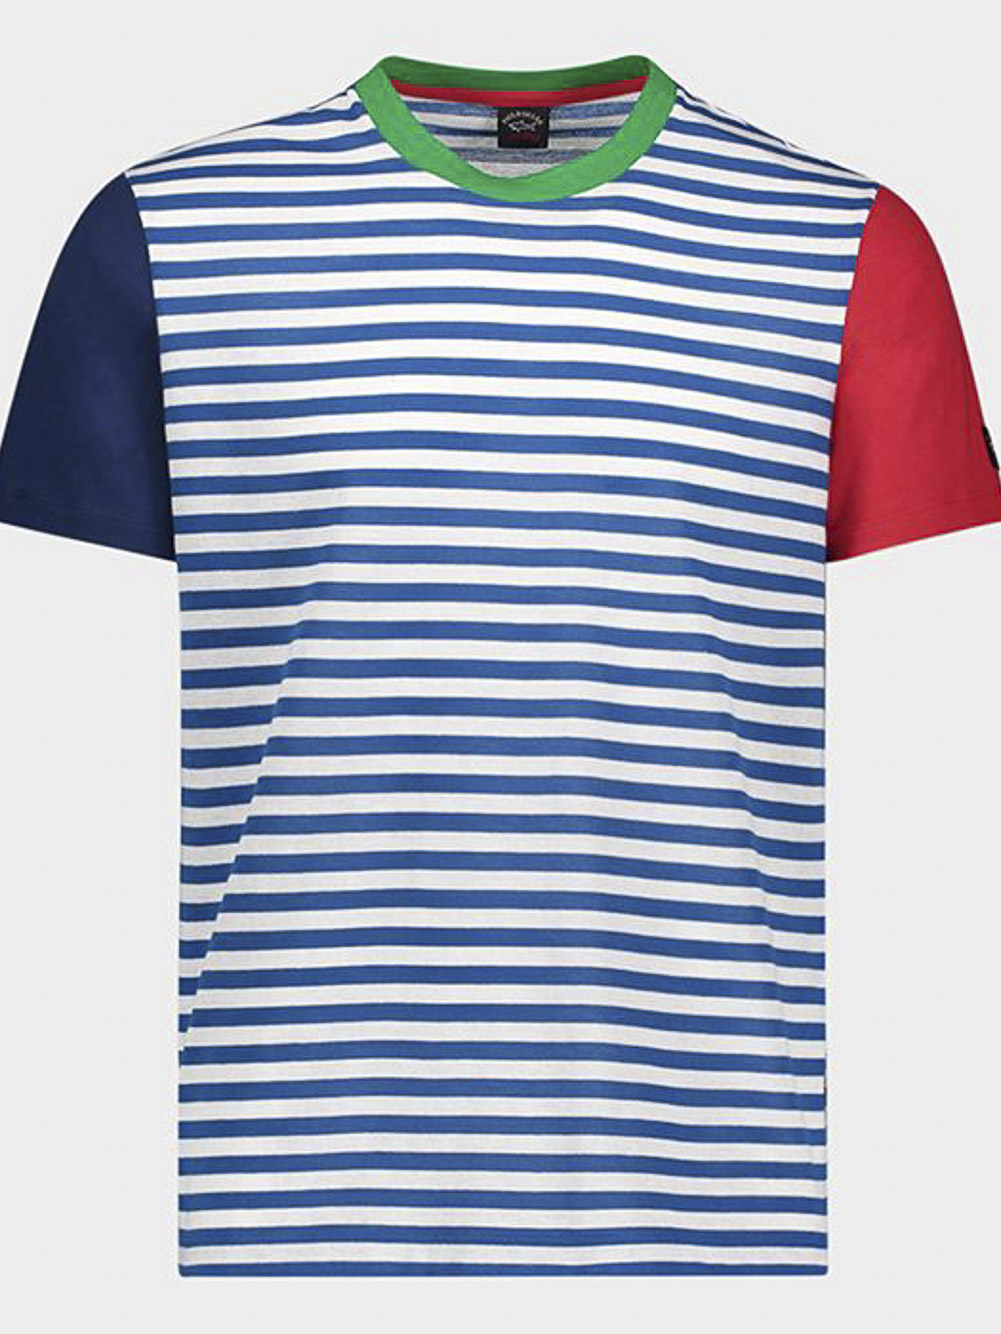 PAUL & SHARK Μπλούζα T-Shirt E20P1112-168 ΡΙΓΕ ΓΑΛΑΖΙΟ